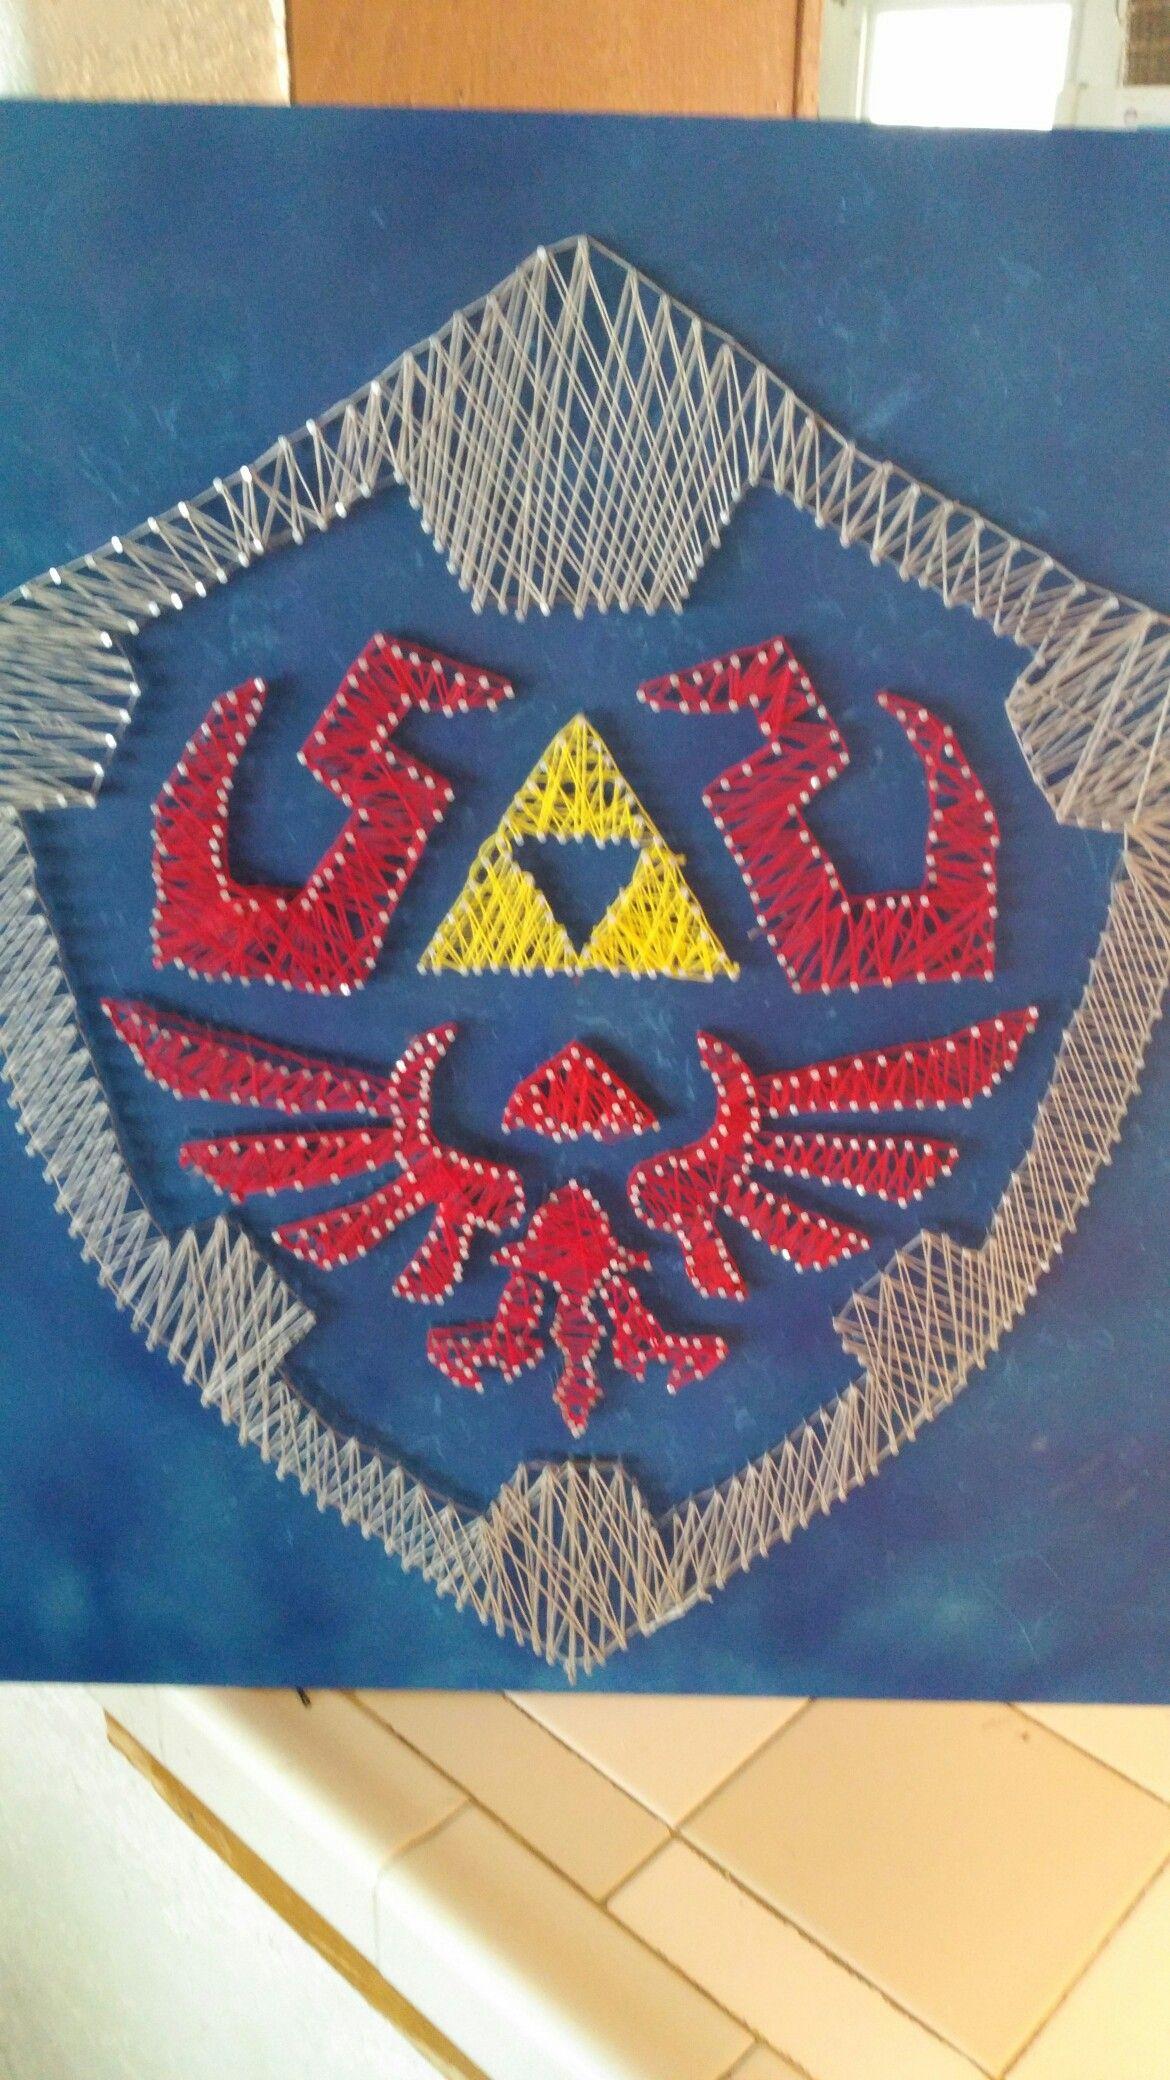 Hylian shield string art